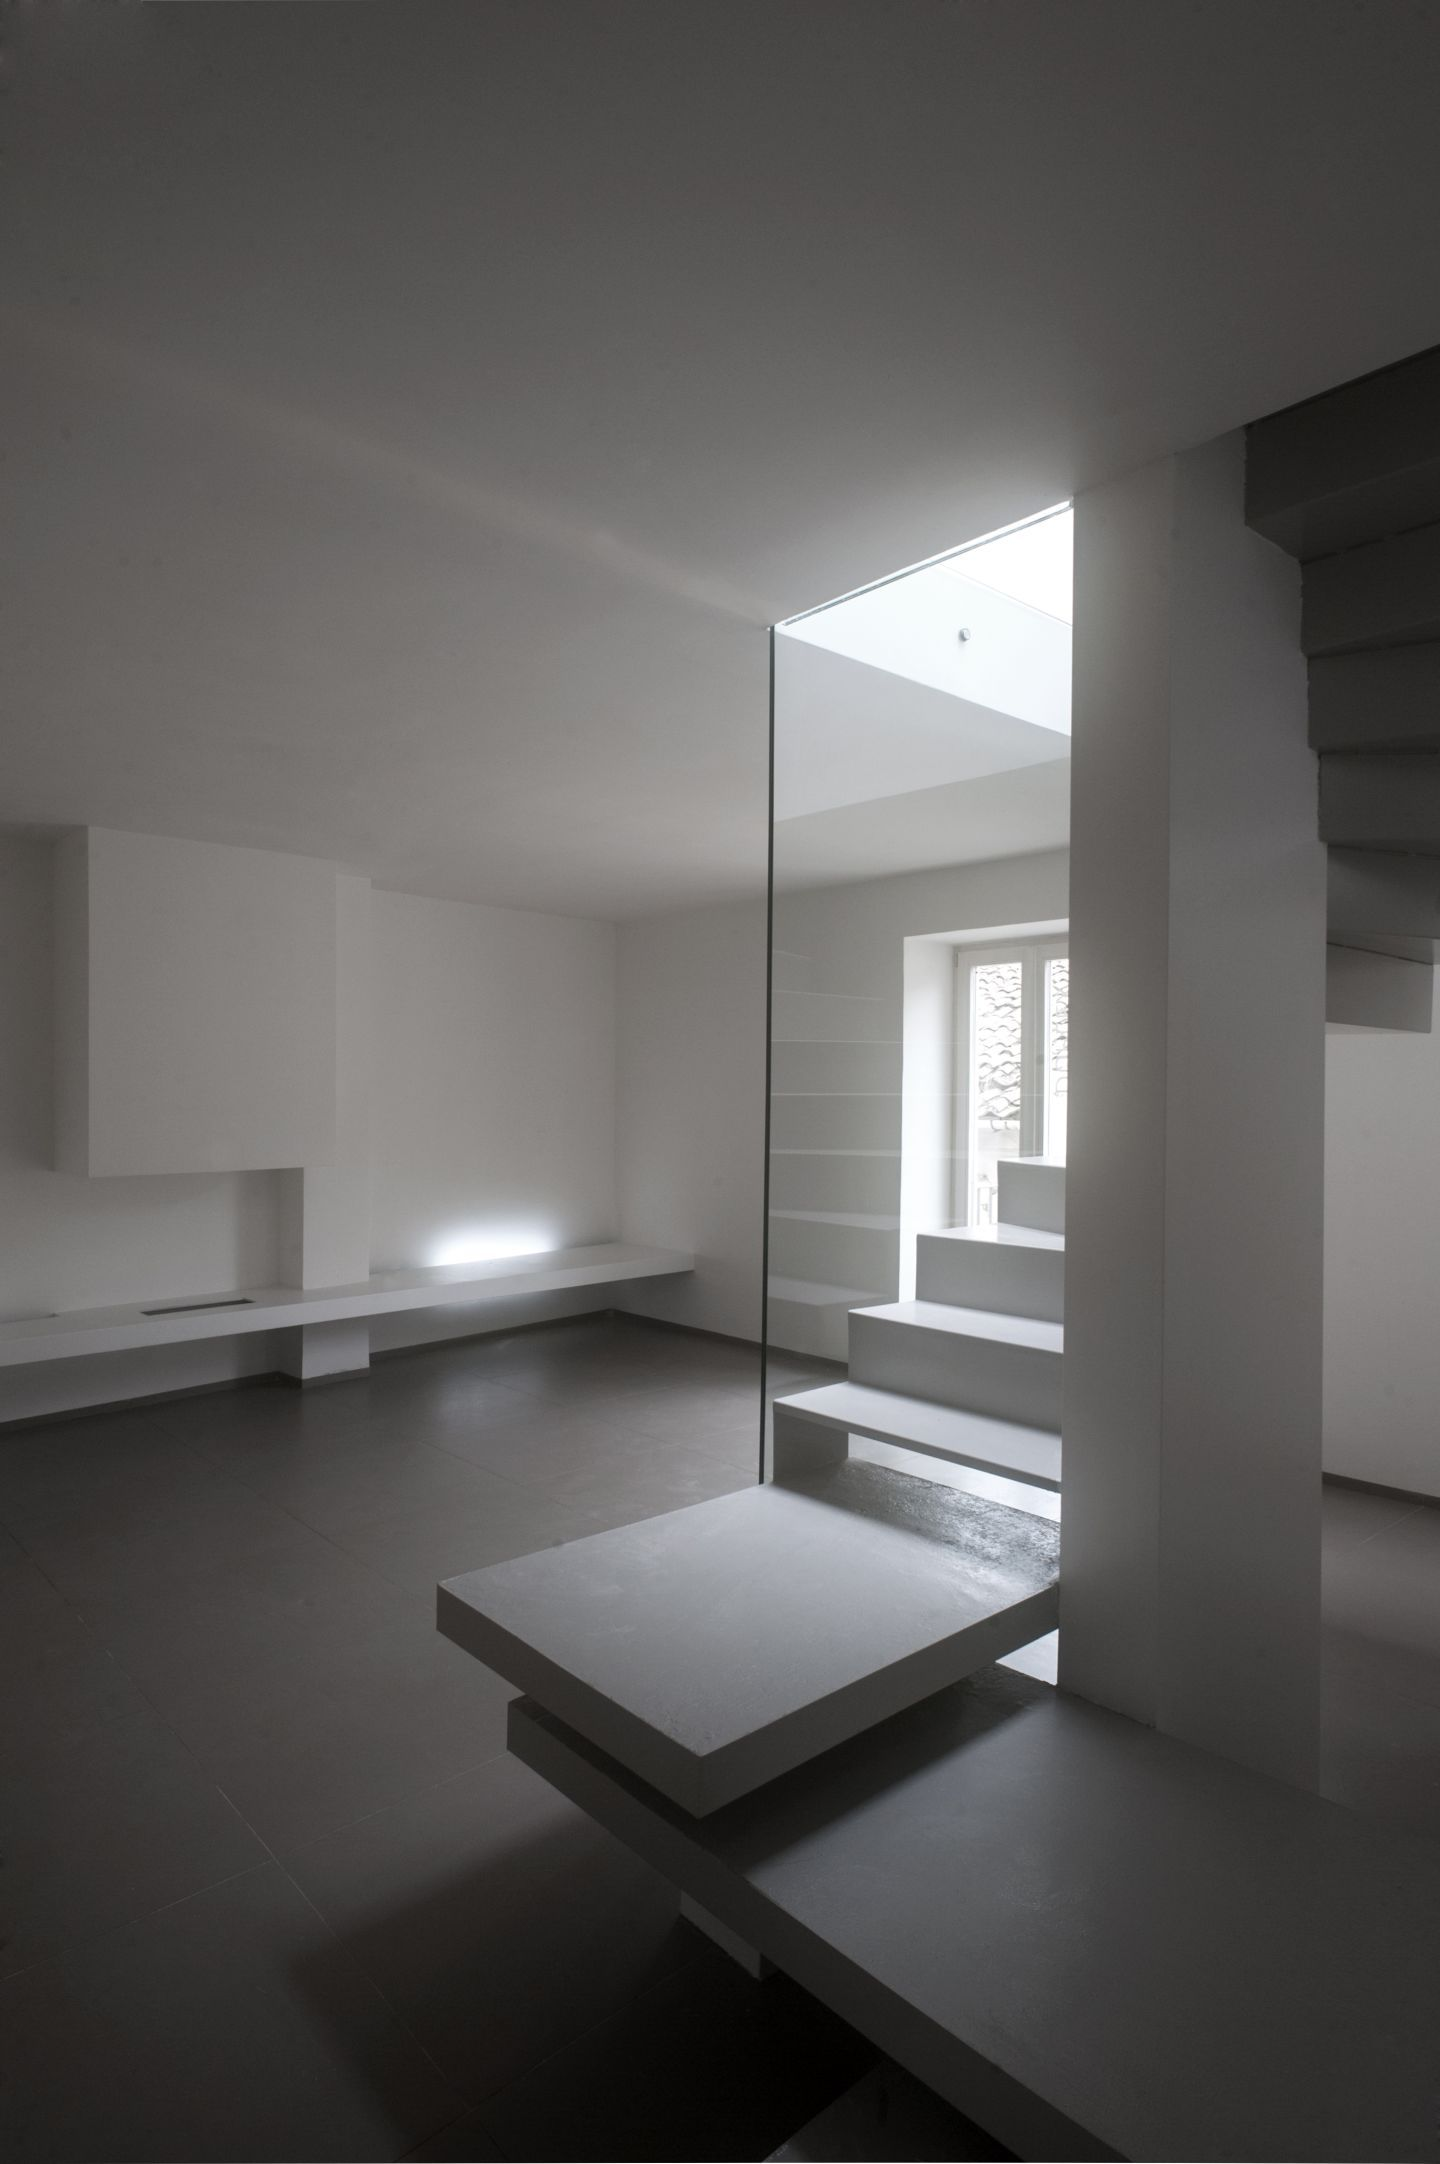 Luigi spina luigi cafiero restoration and renovation of a historical building in caserta - Interior designer caserta ...